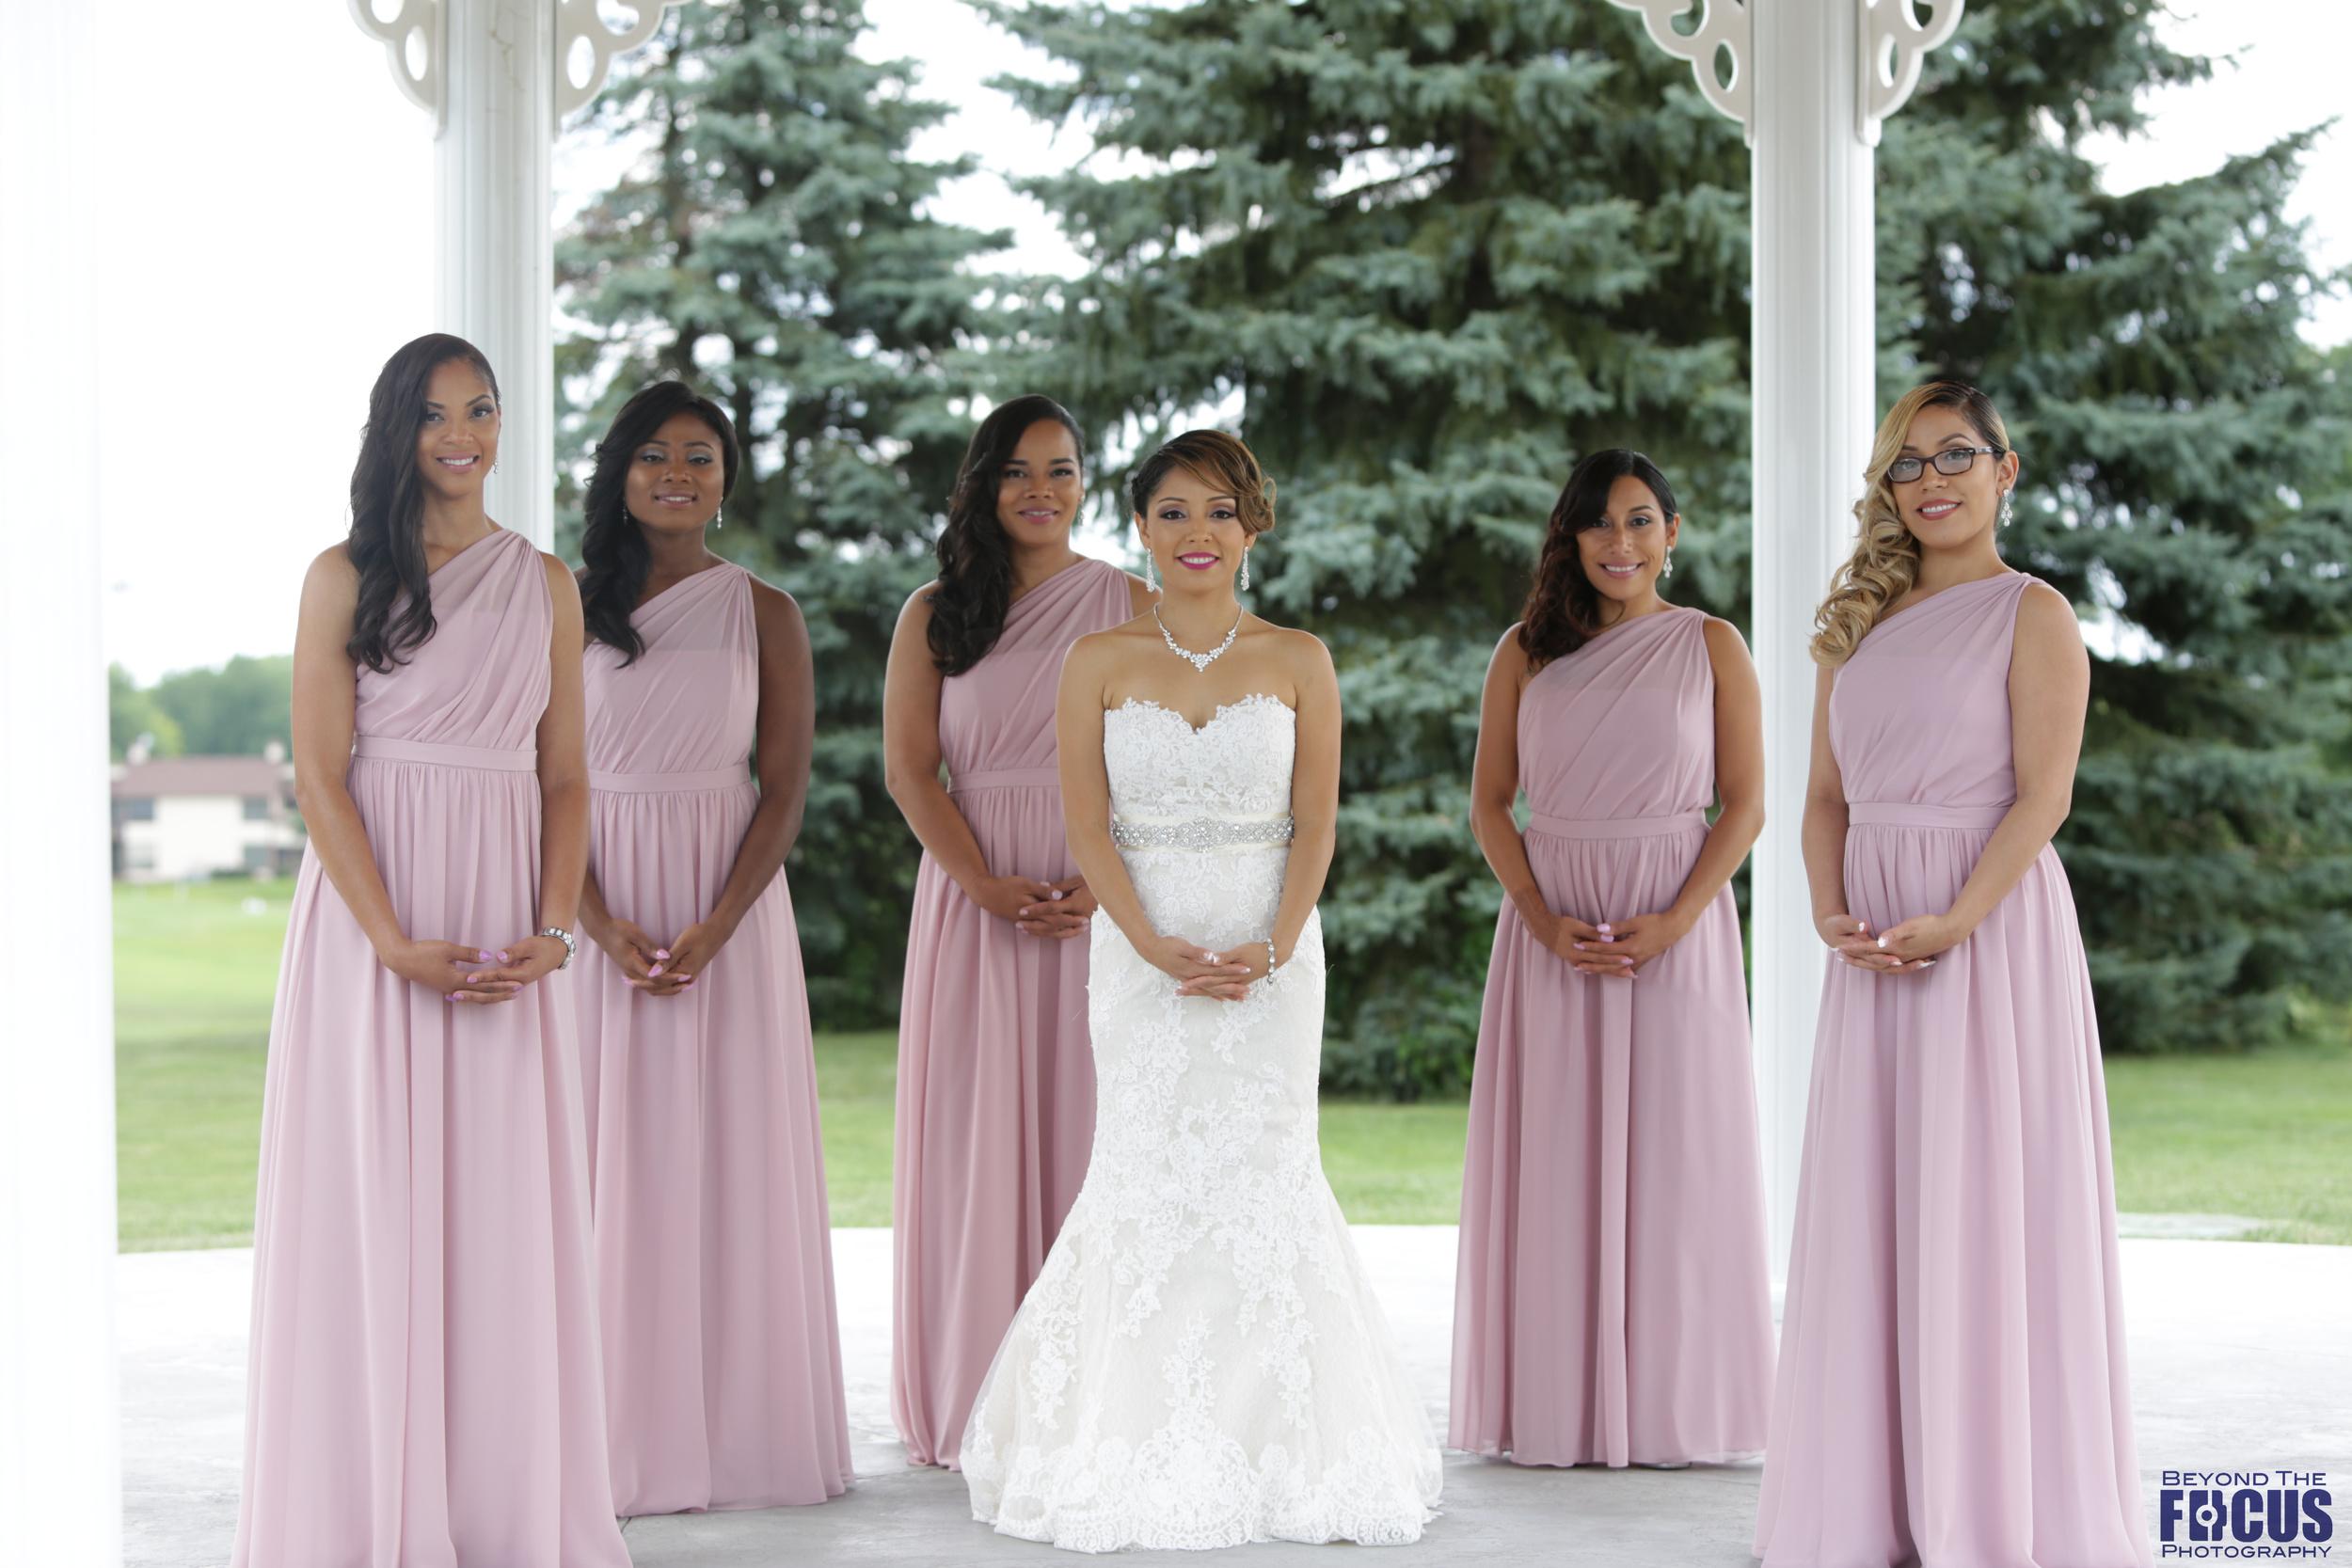 Palmer Wedding - Candids30.jpg